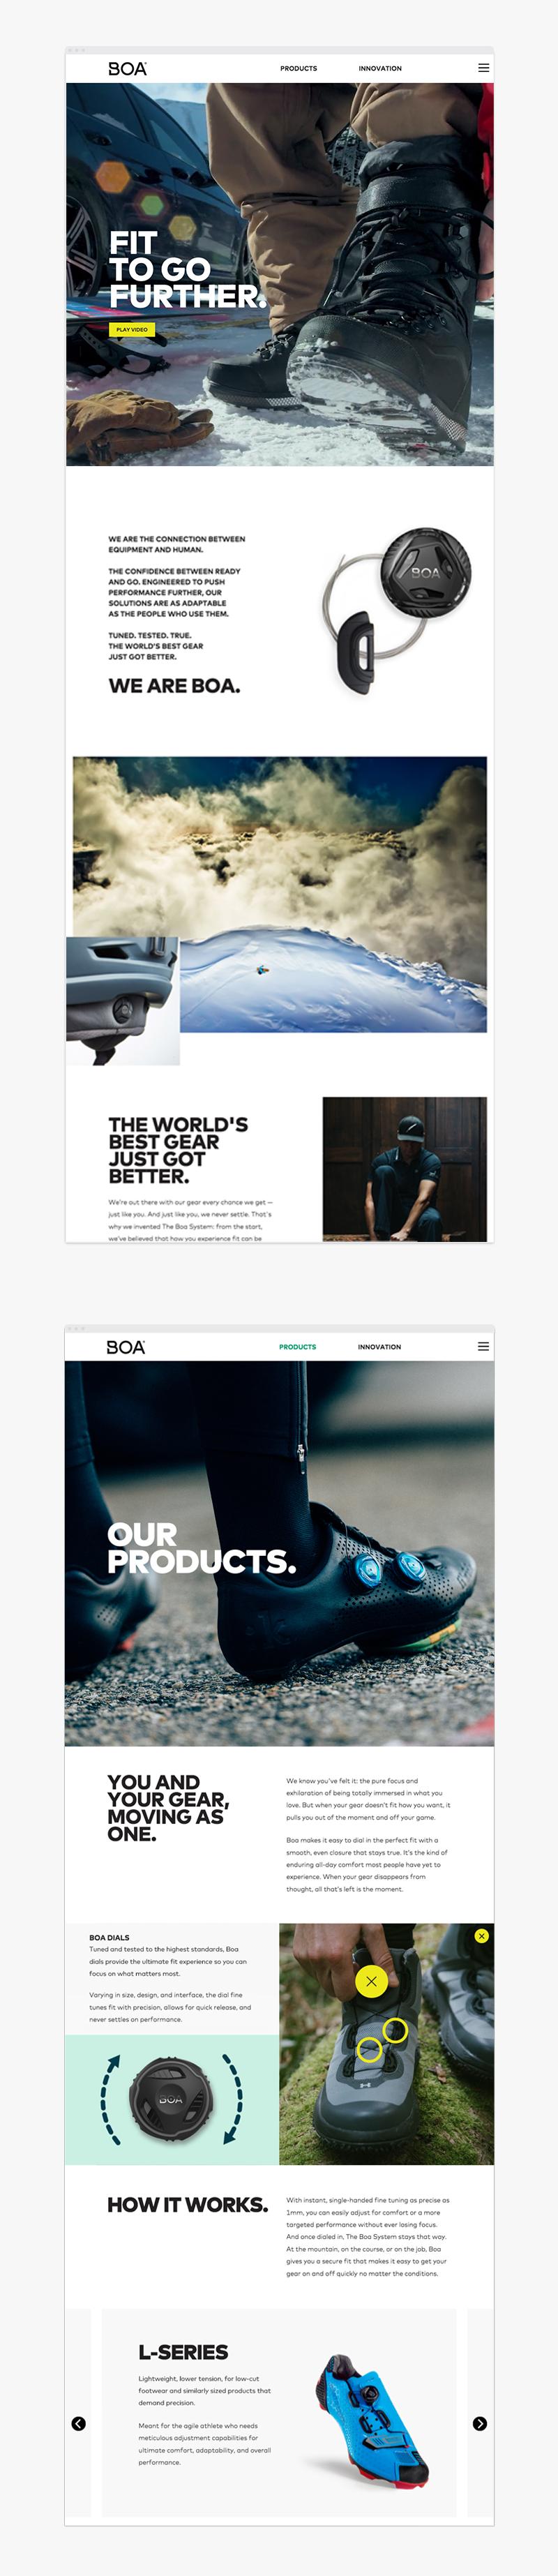 Boa Digital Desktop Mobile